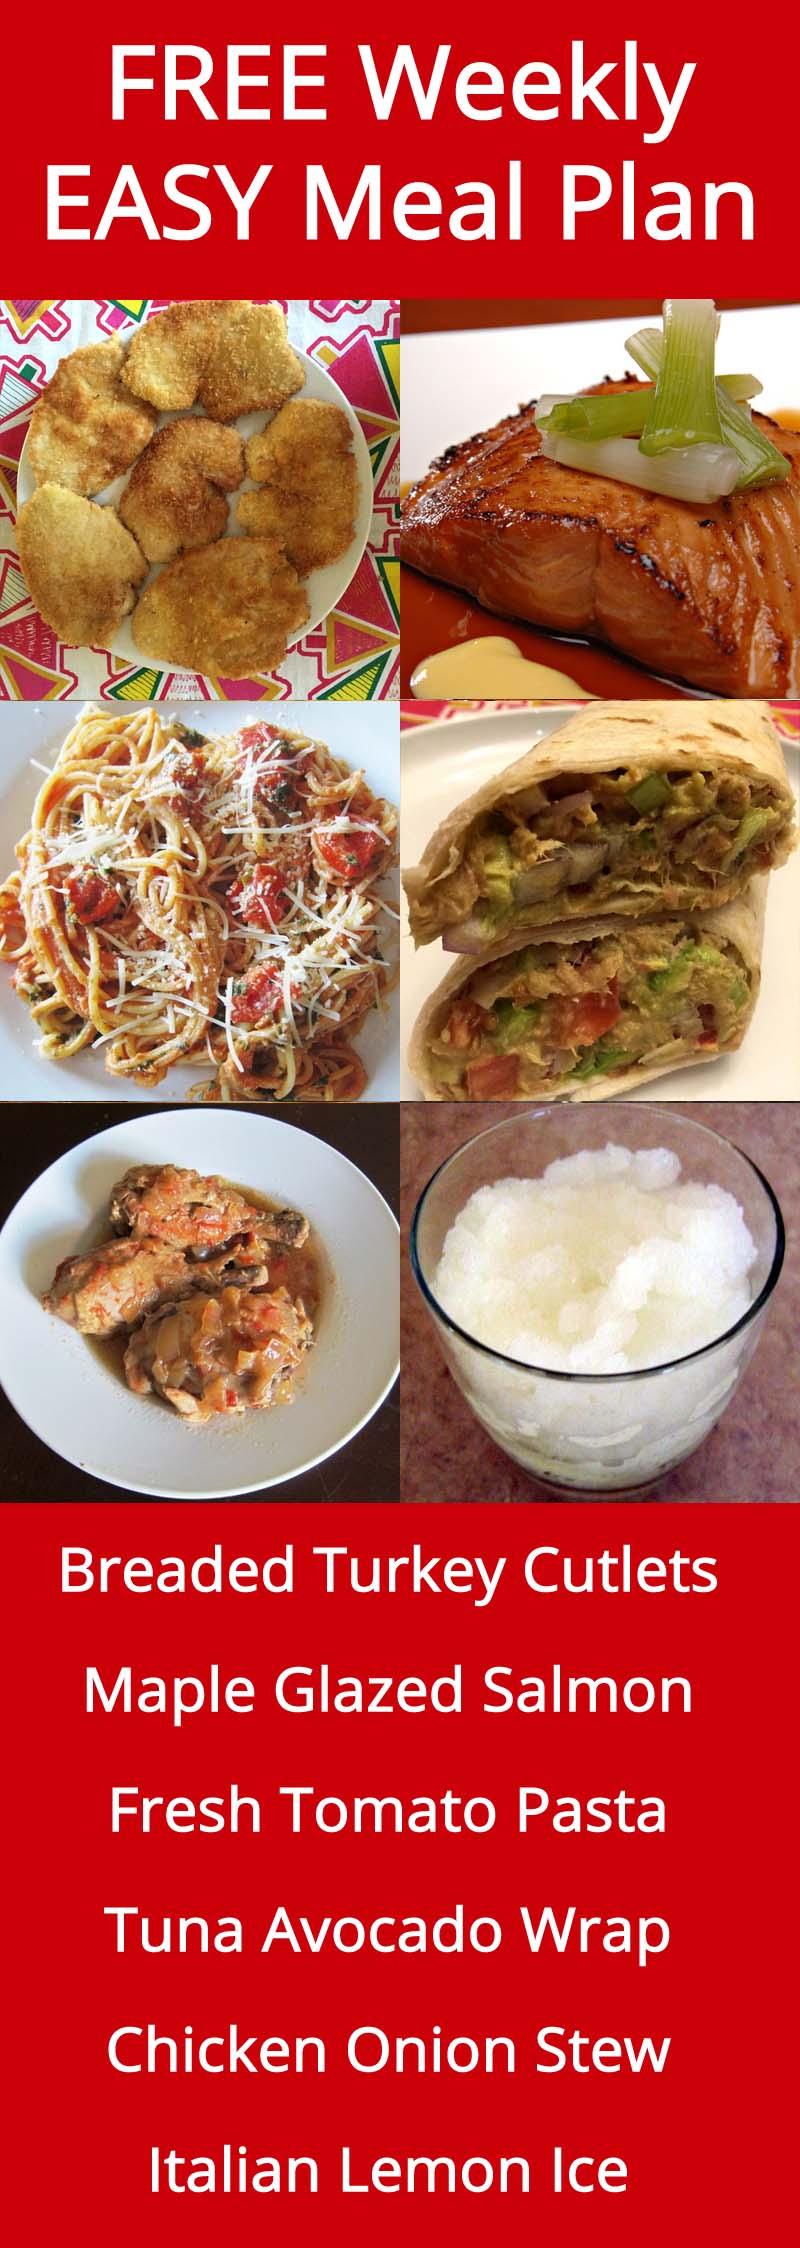 FREE Weekly Easy Family Meal Plan - Week 26 Recipes | MelanieCooks.com